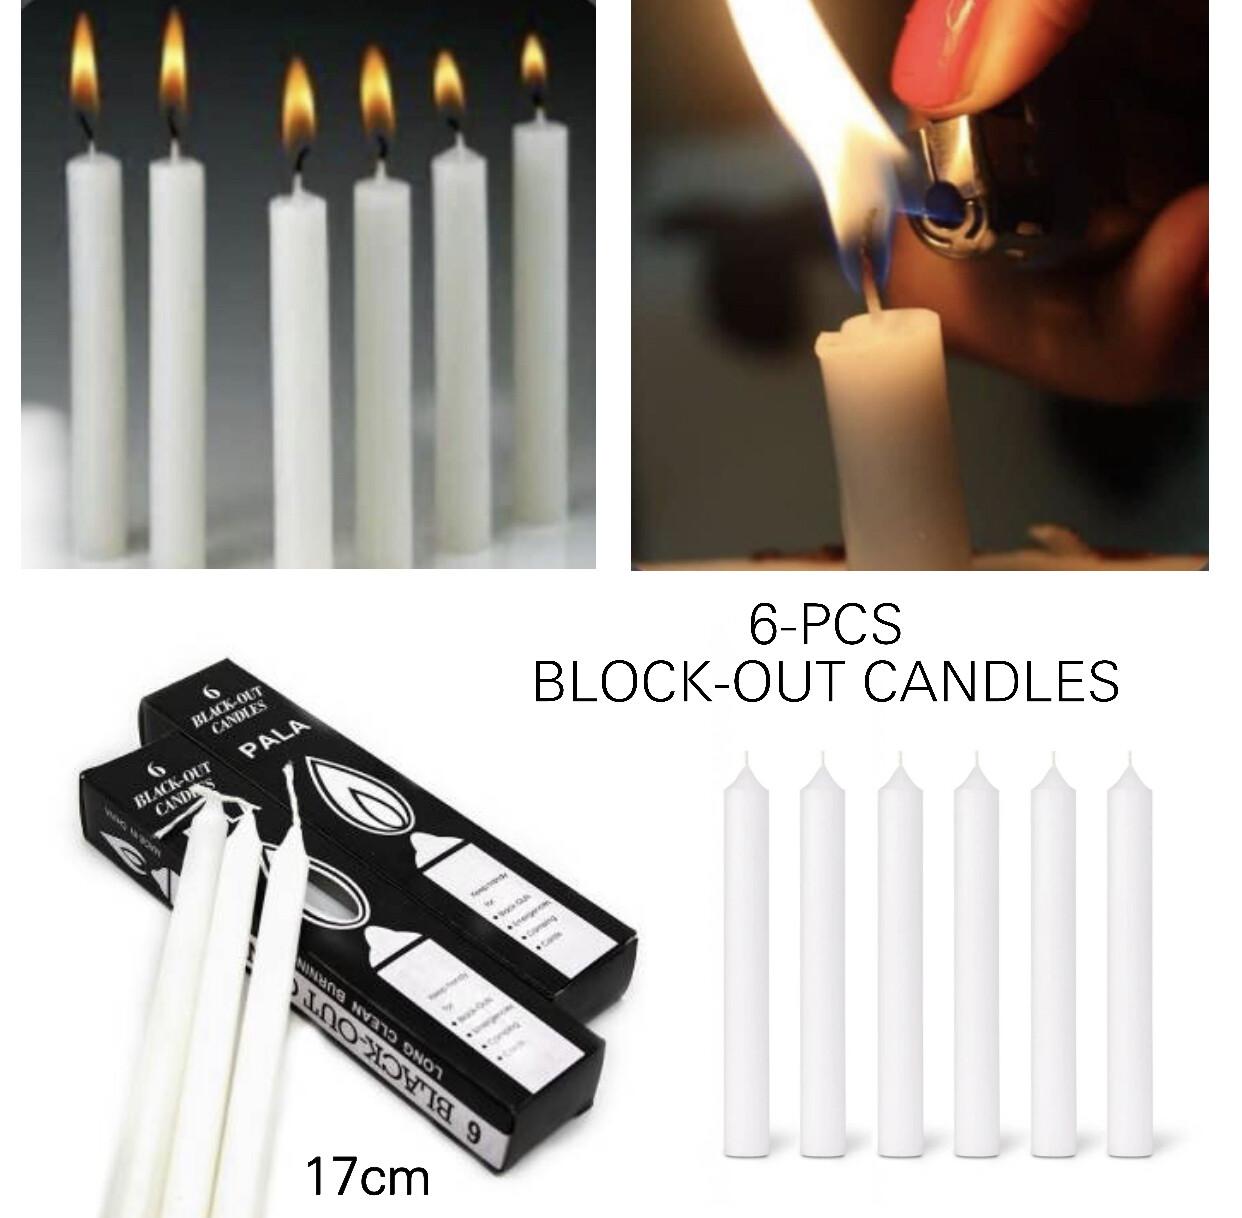 6-Pcs Candles Box